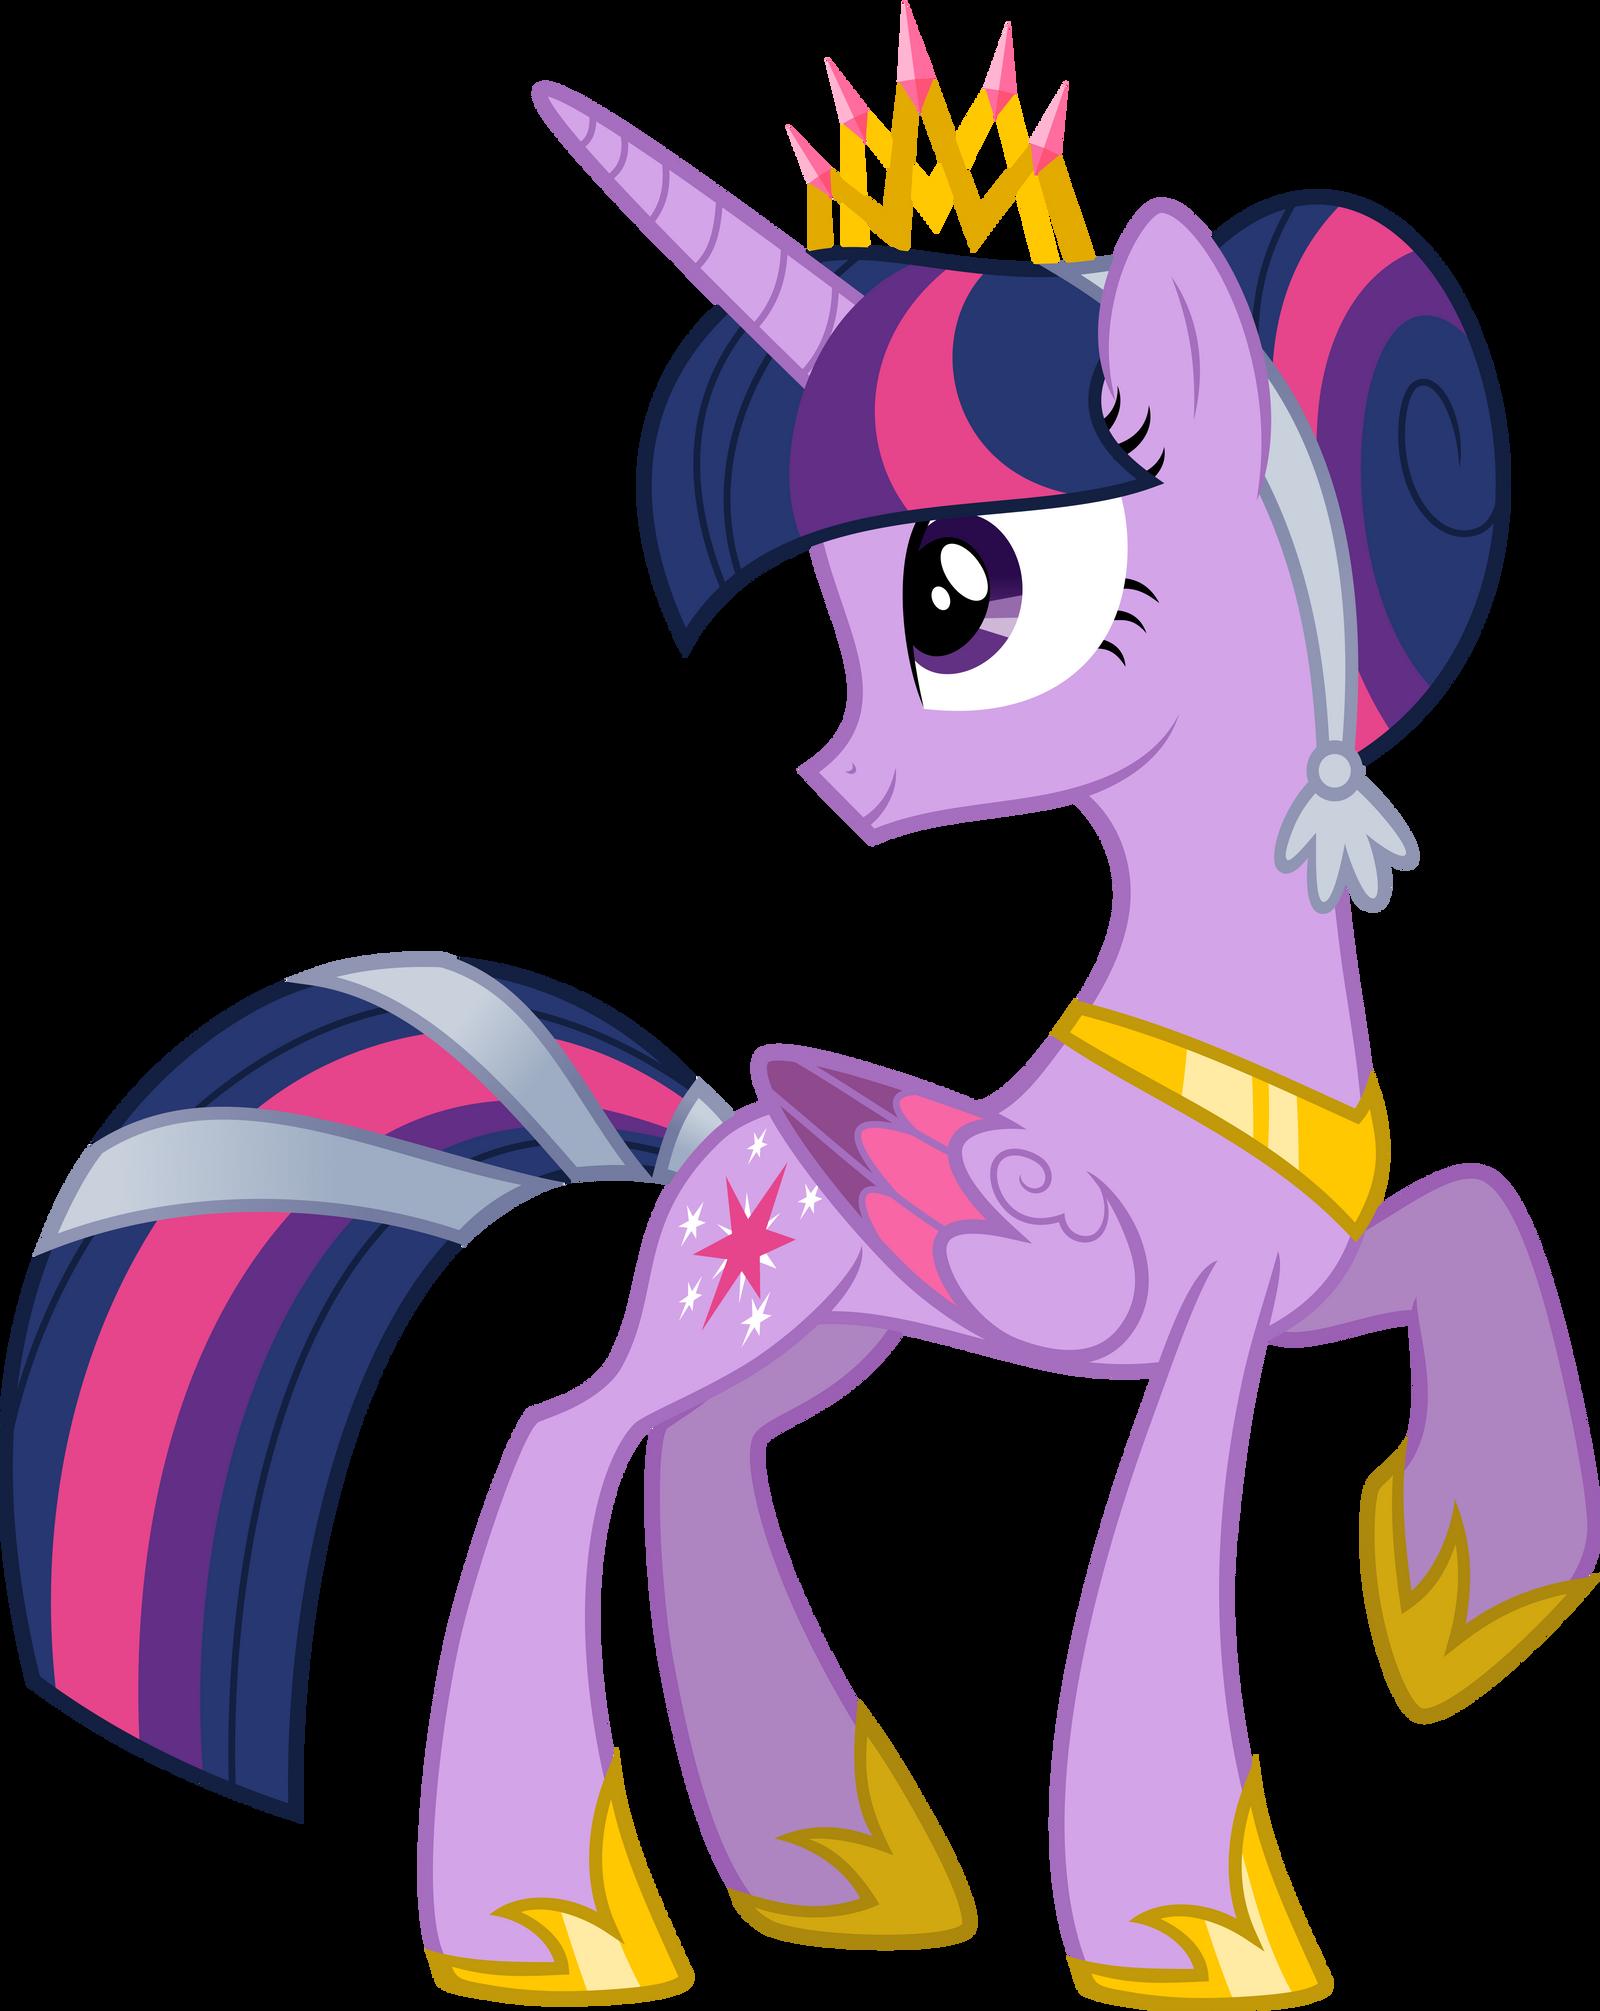 Princess Twilight Sparkle By DecPrincess On DeviantArt